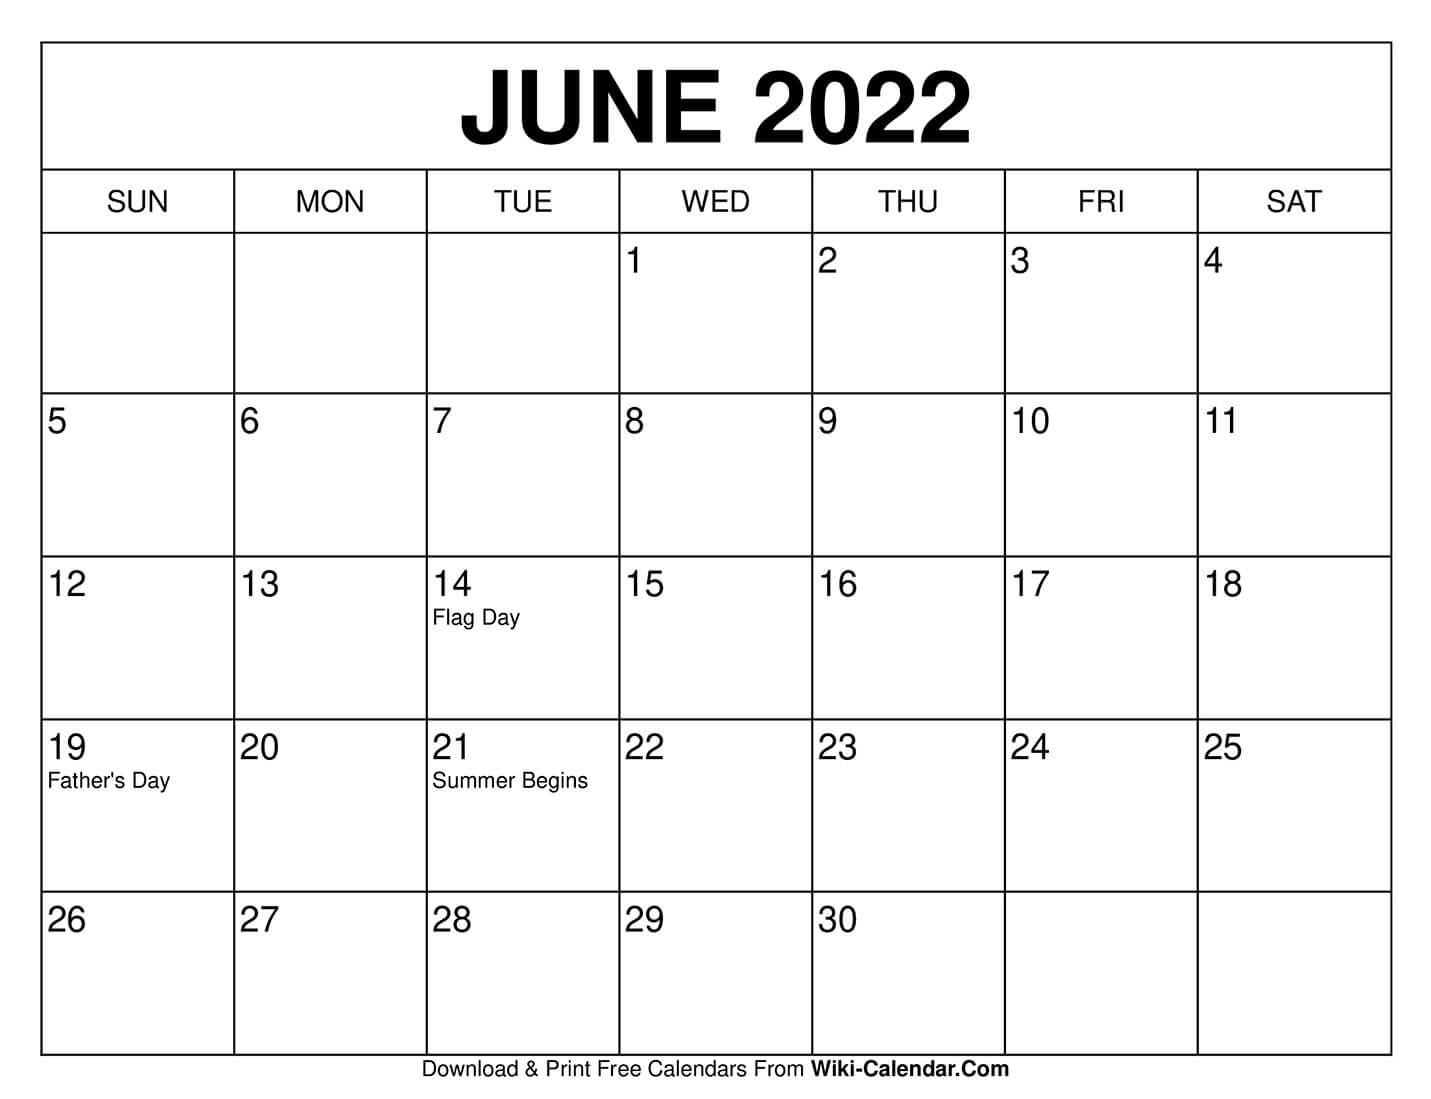 June 2022 Calendar Calendar printables calendars to print 1431x1099